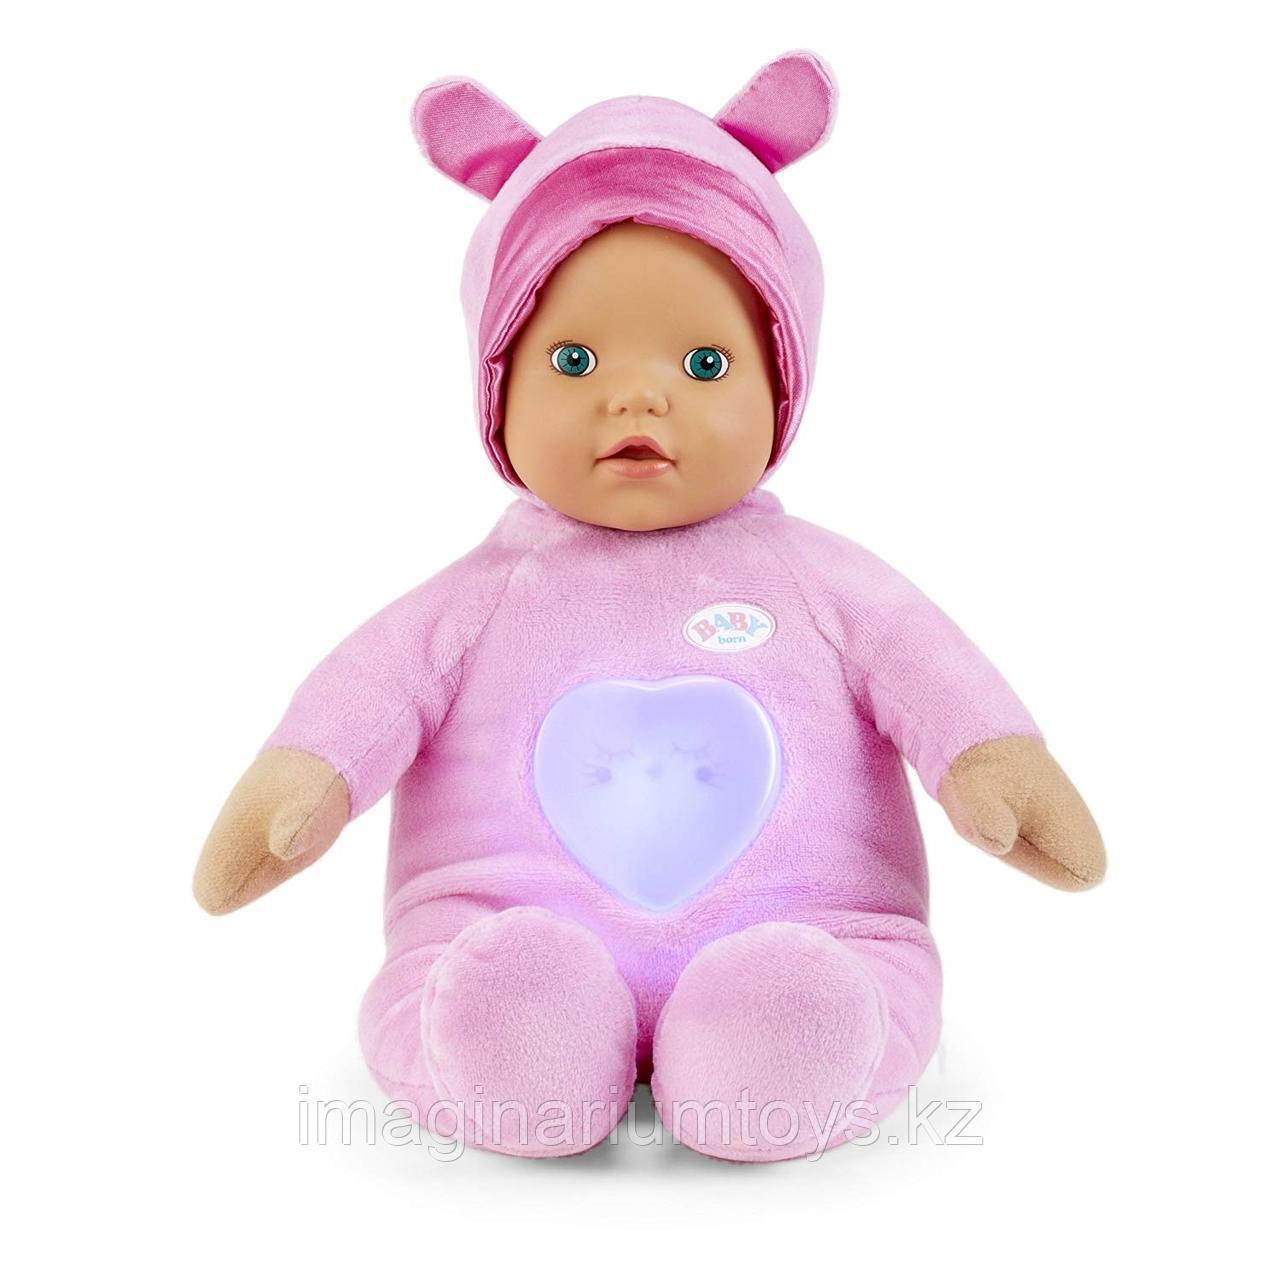 Кукла Беби Борн для малышей 0+ интерактивная Baby Born